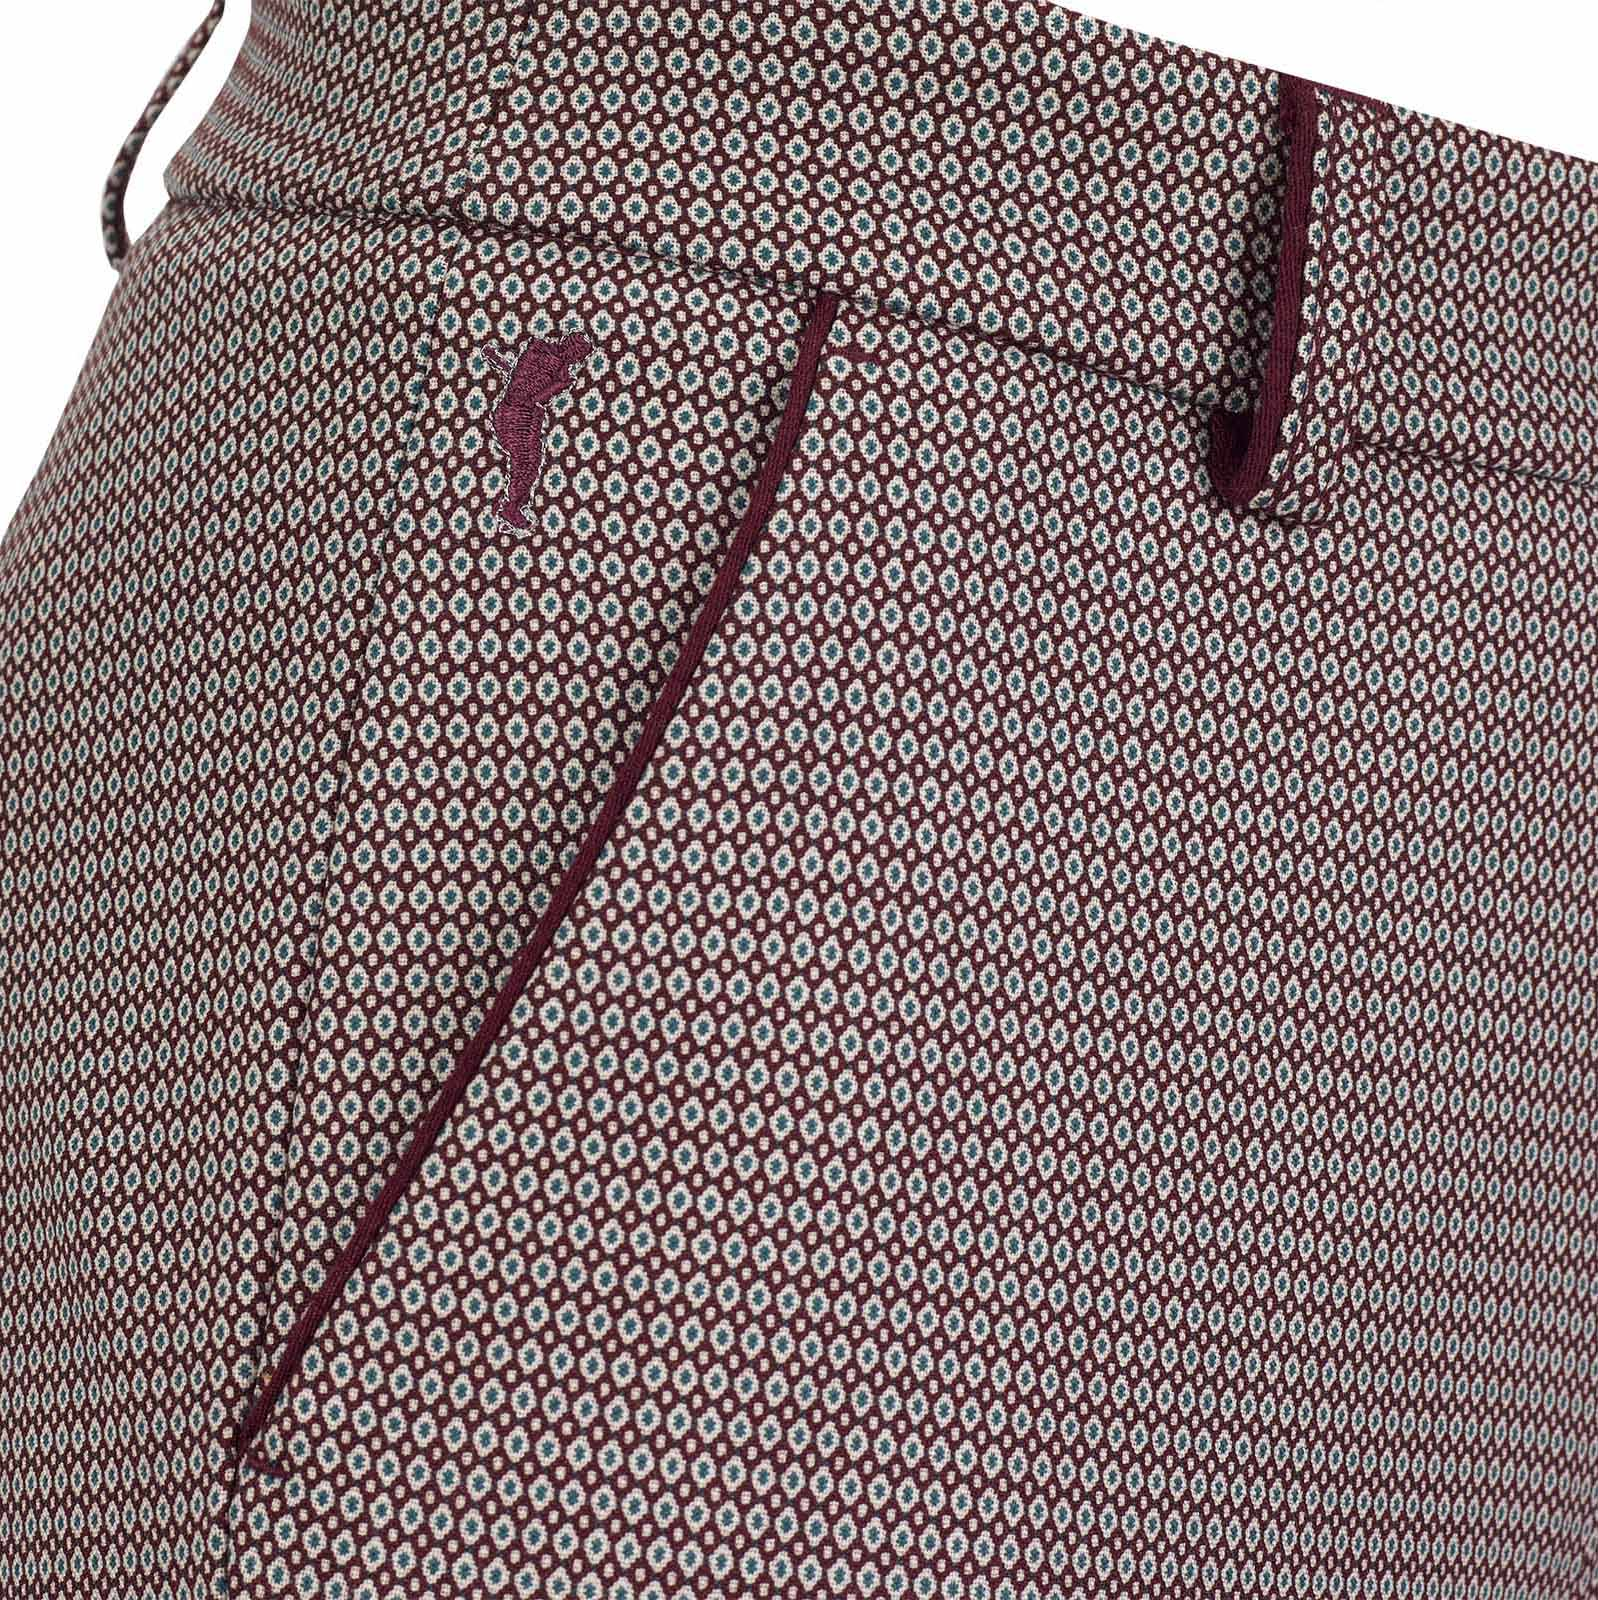 Elegante Damen Jacquard Stretchhose mit modischem Muster und softem Touch